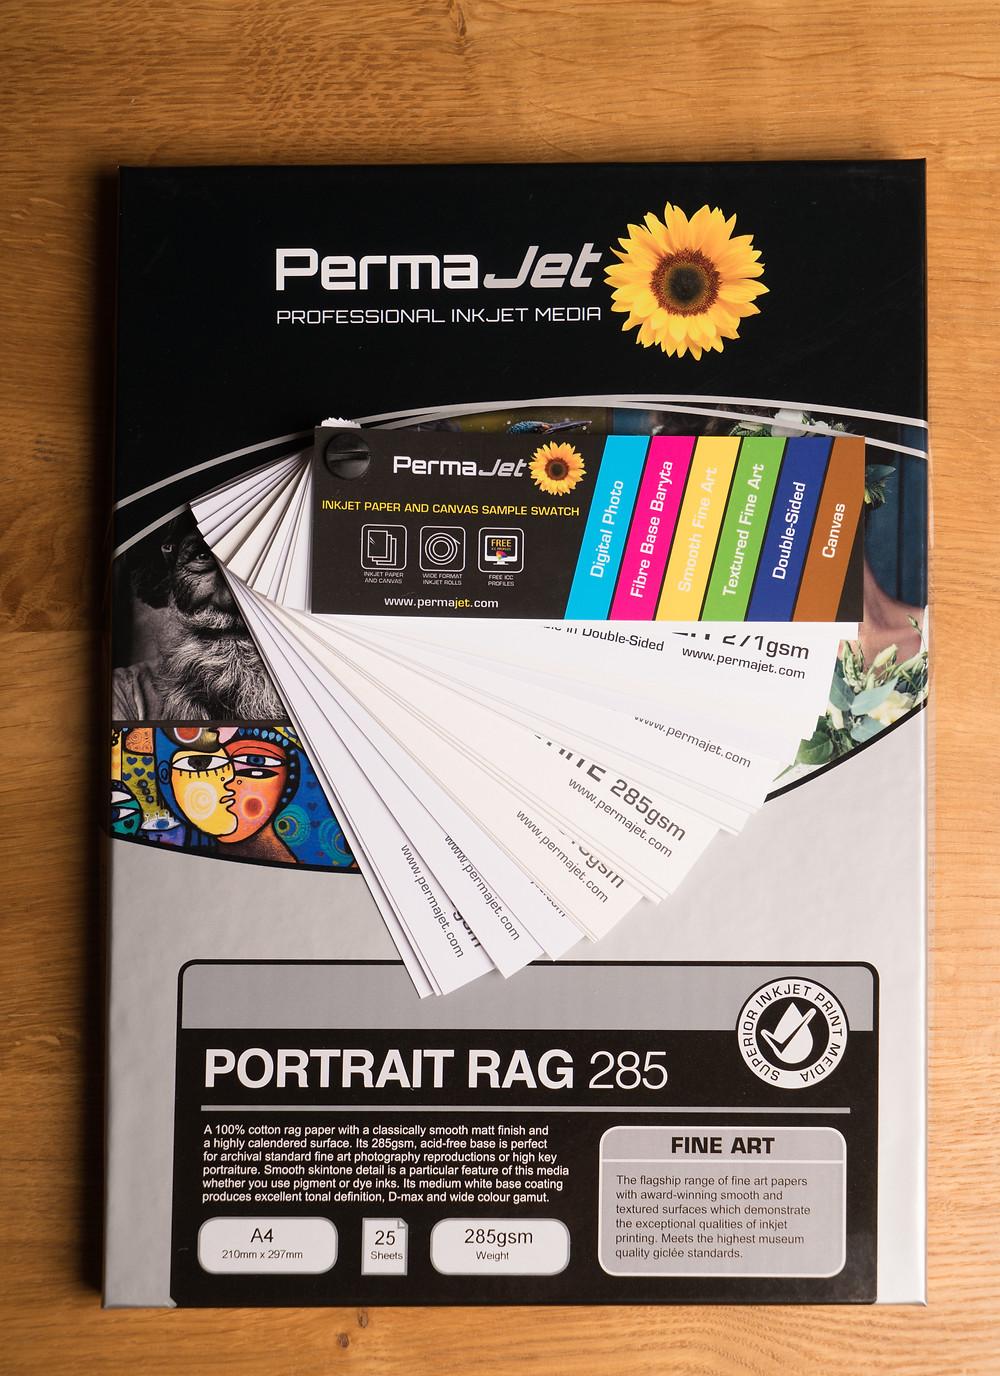 Box of PermaJet Portrait Rag with a swatch